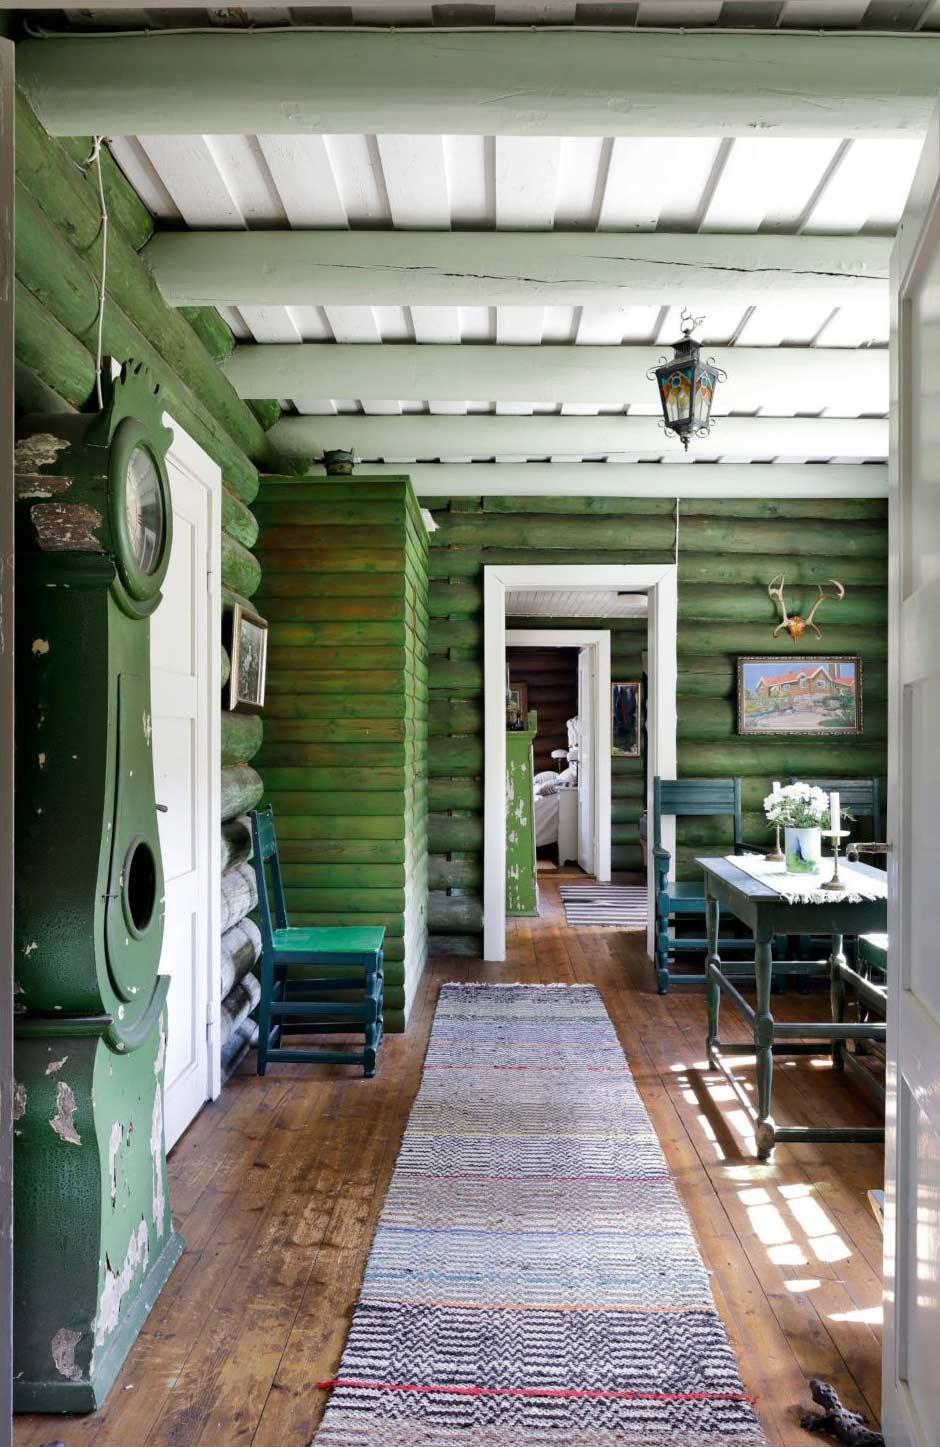 Sarvilinna, the Green Room